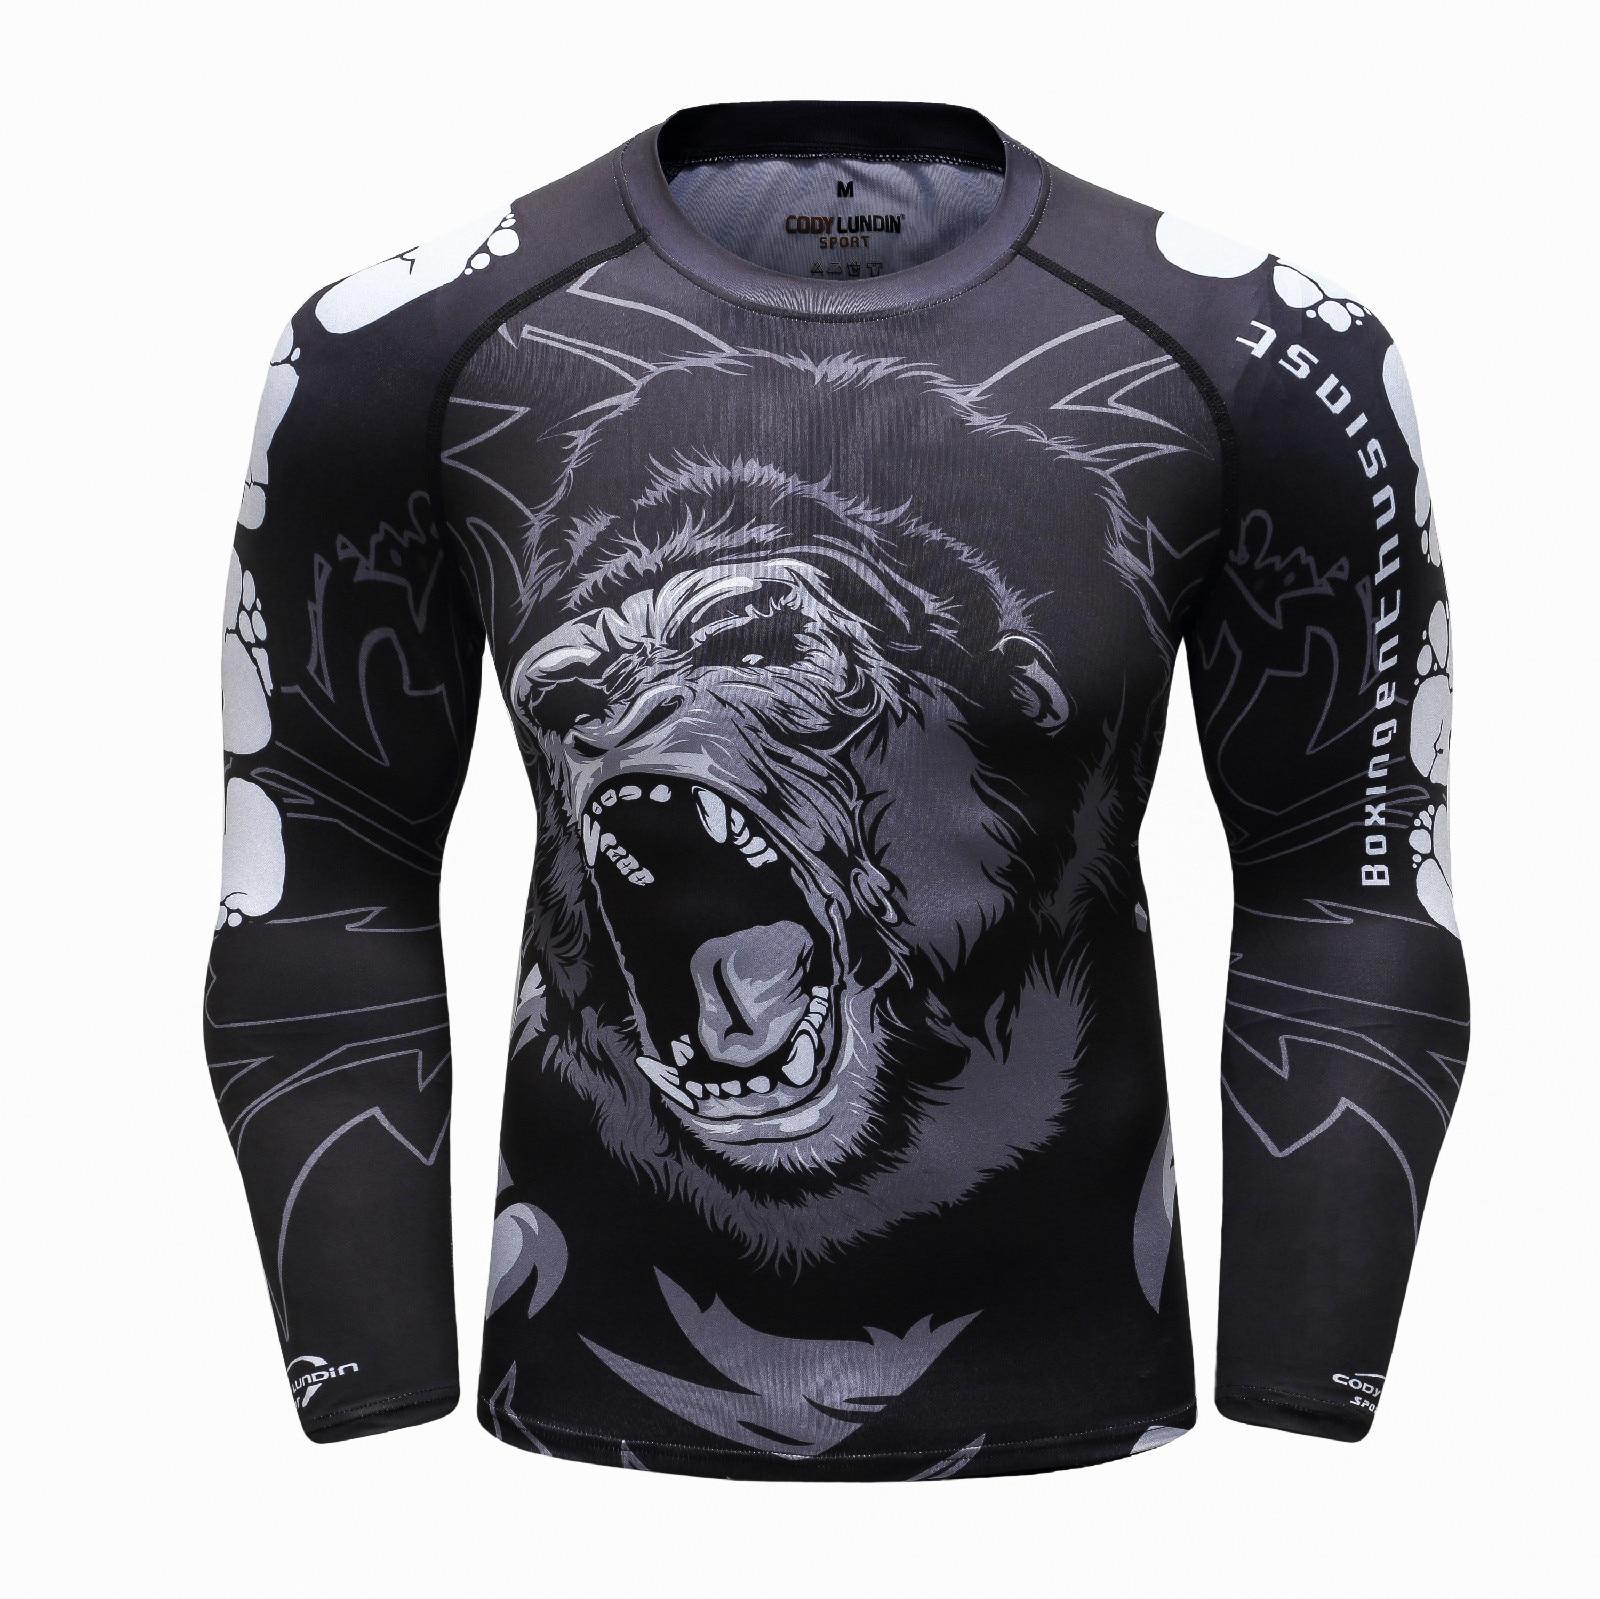 3D MMA T Shirt Herren Rashguard Jiu Jitsu Bjj T-shirt Compression Shirt Muay Thai Breathable Boxing Jerseys Fight Jersey Men's